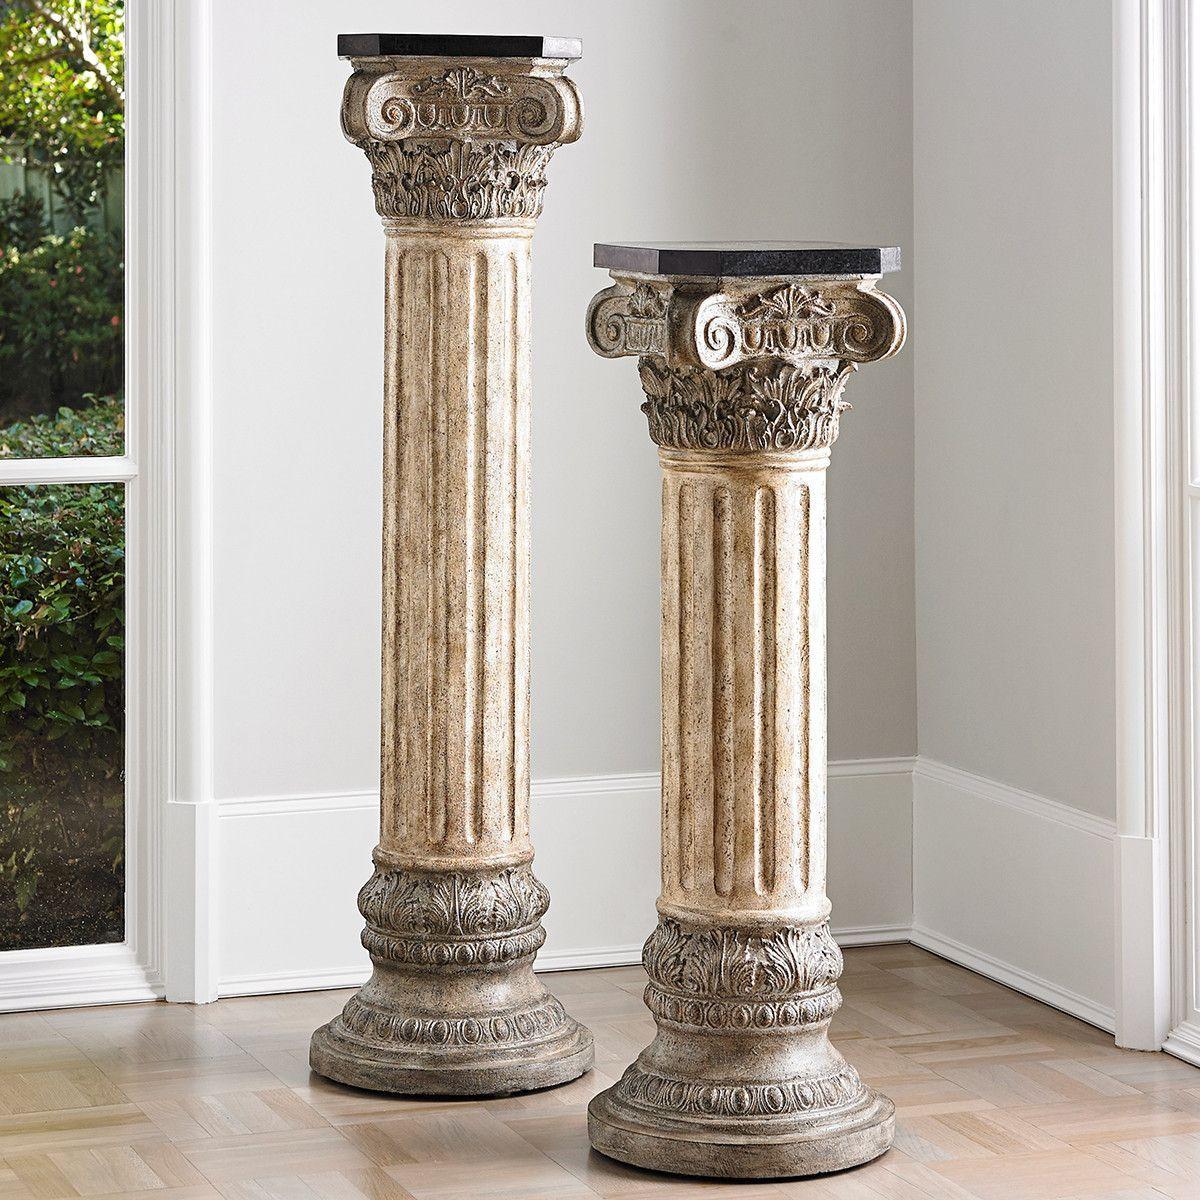 Ambella home corinthian majesty pedestal products pinterest